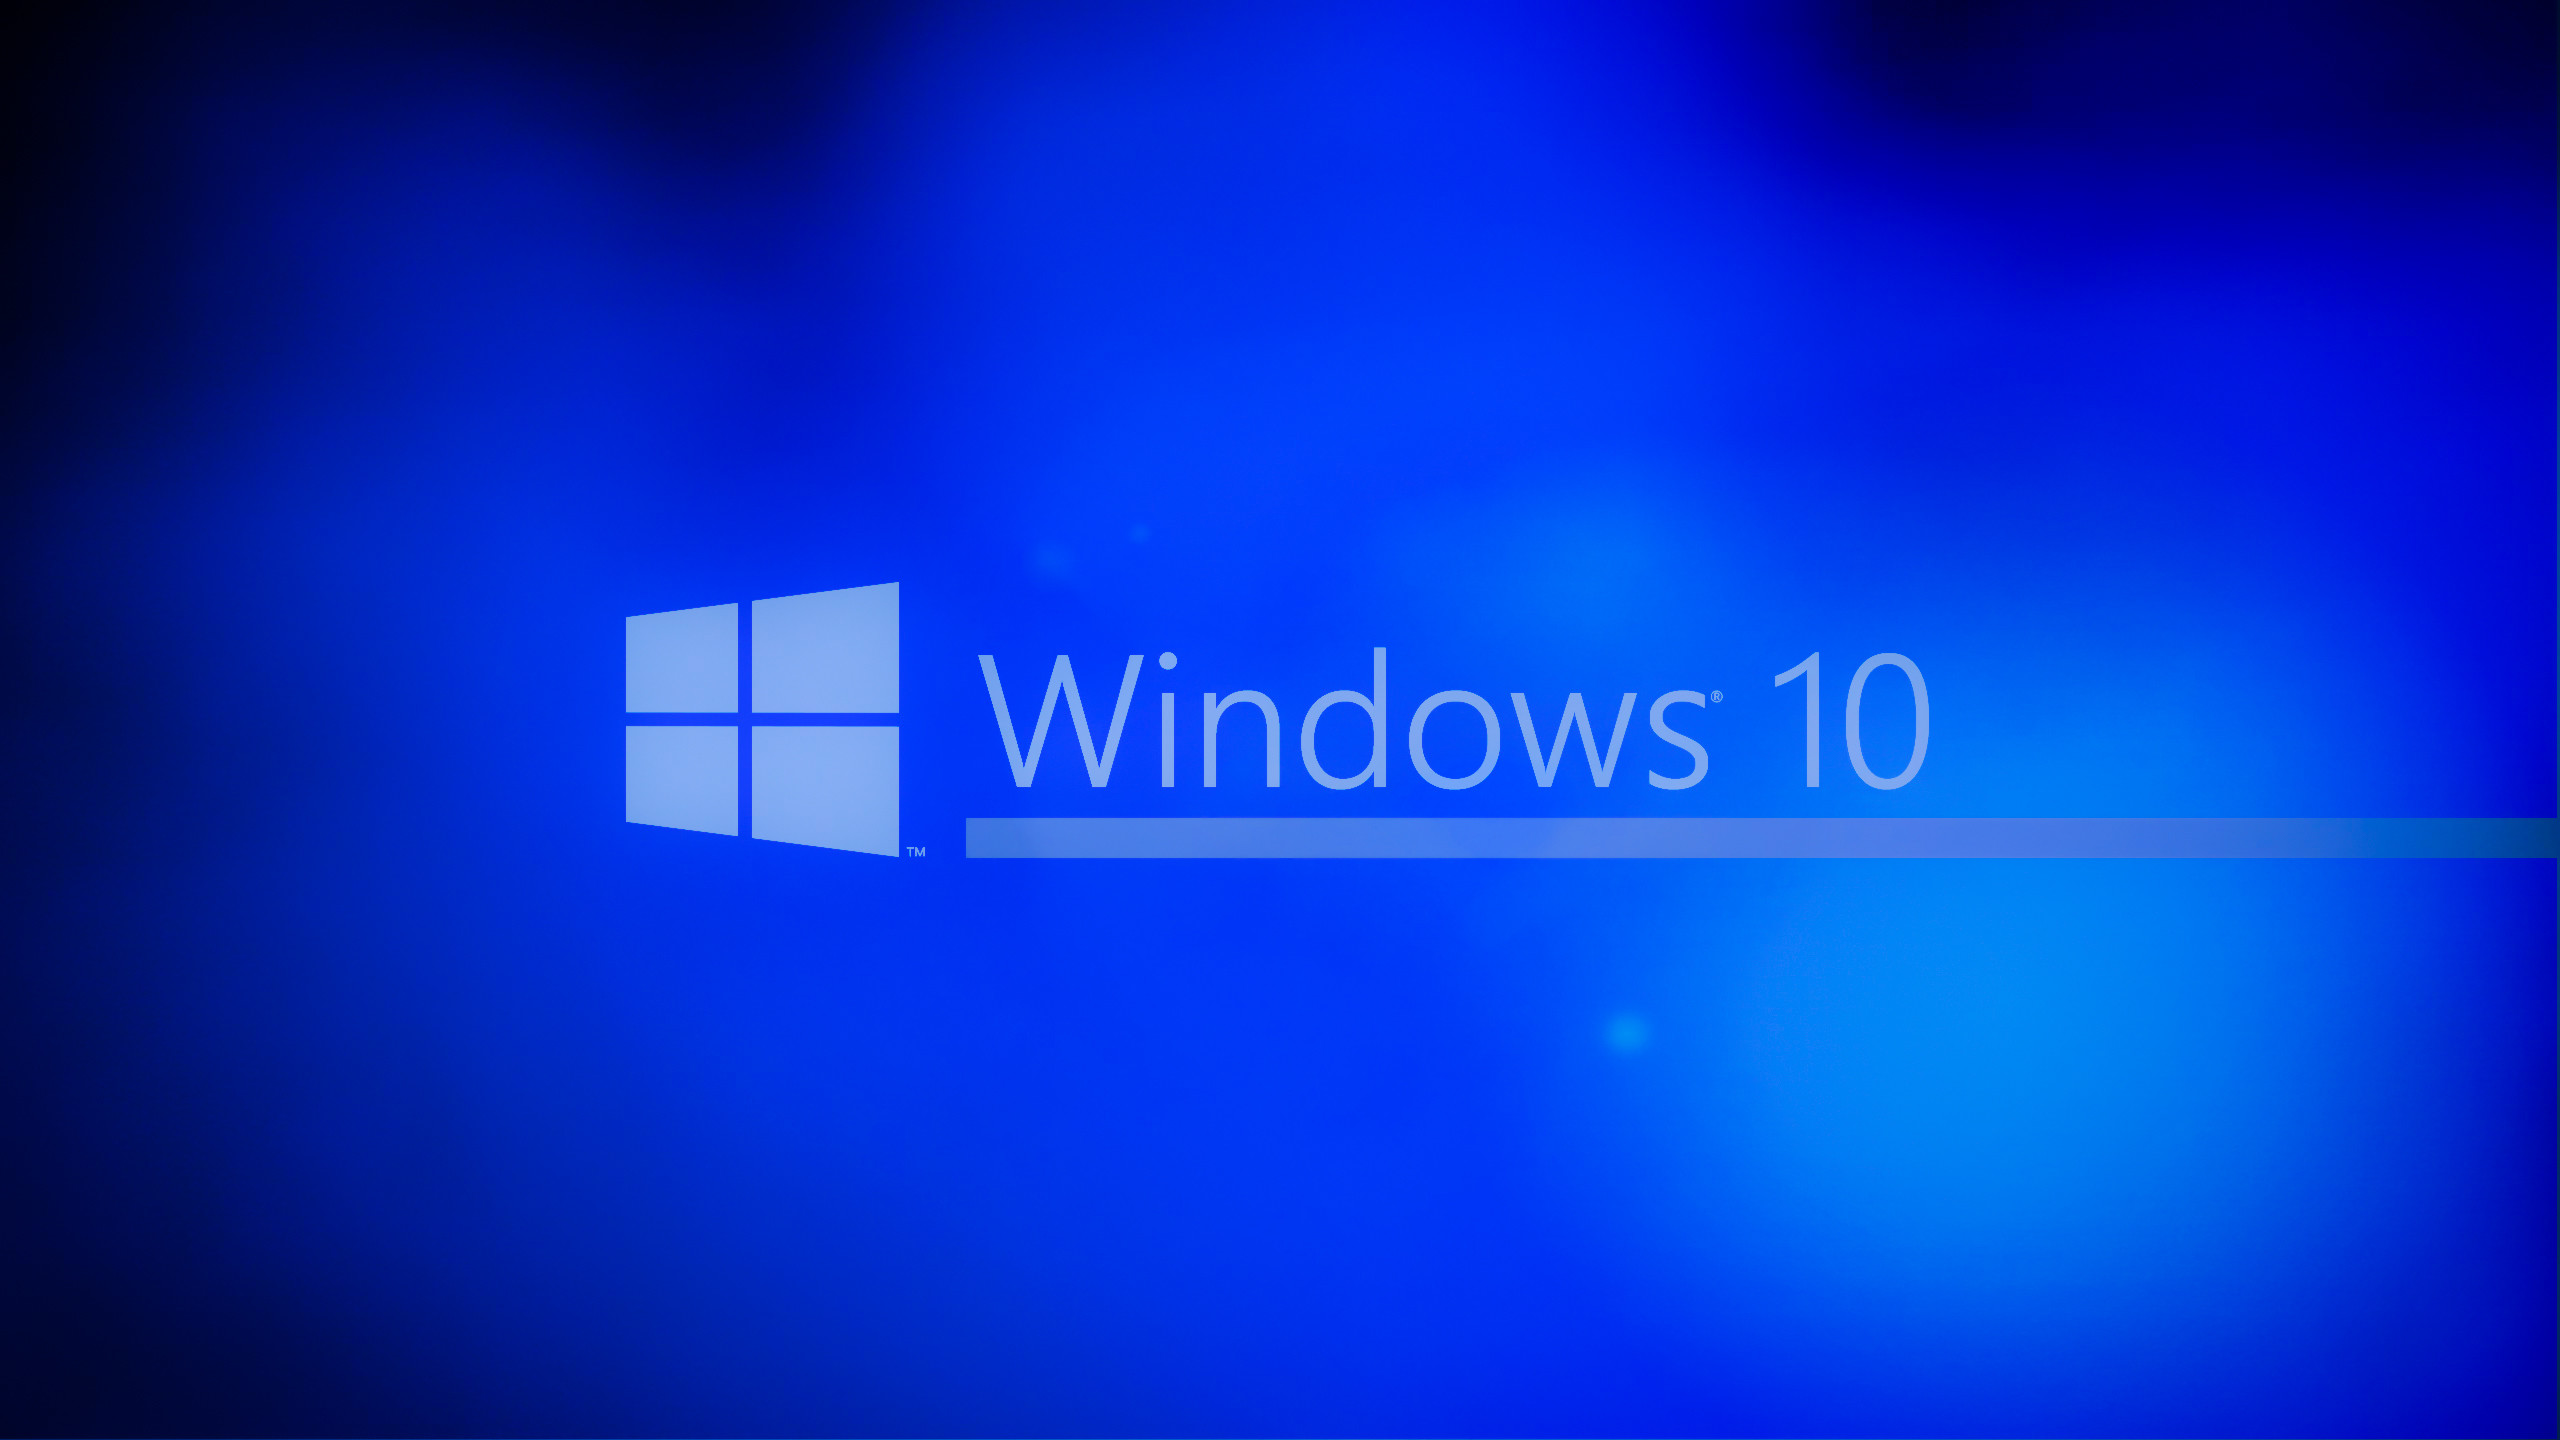 Res: 2560x1440, Windows 10 Wallpaper Logo Start HD Wallpapers Ultra HD Wallpapers